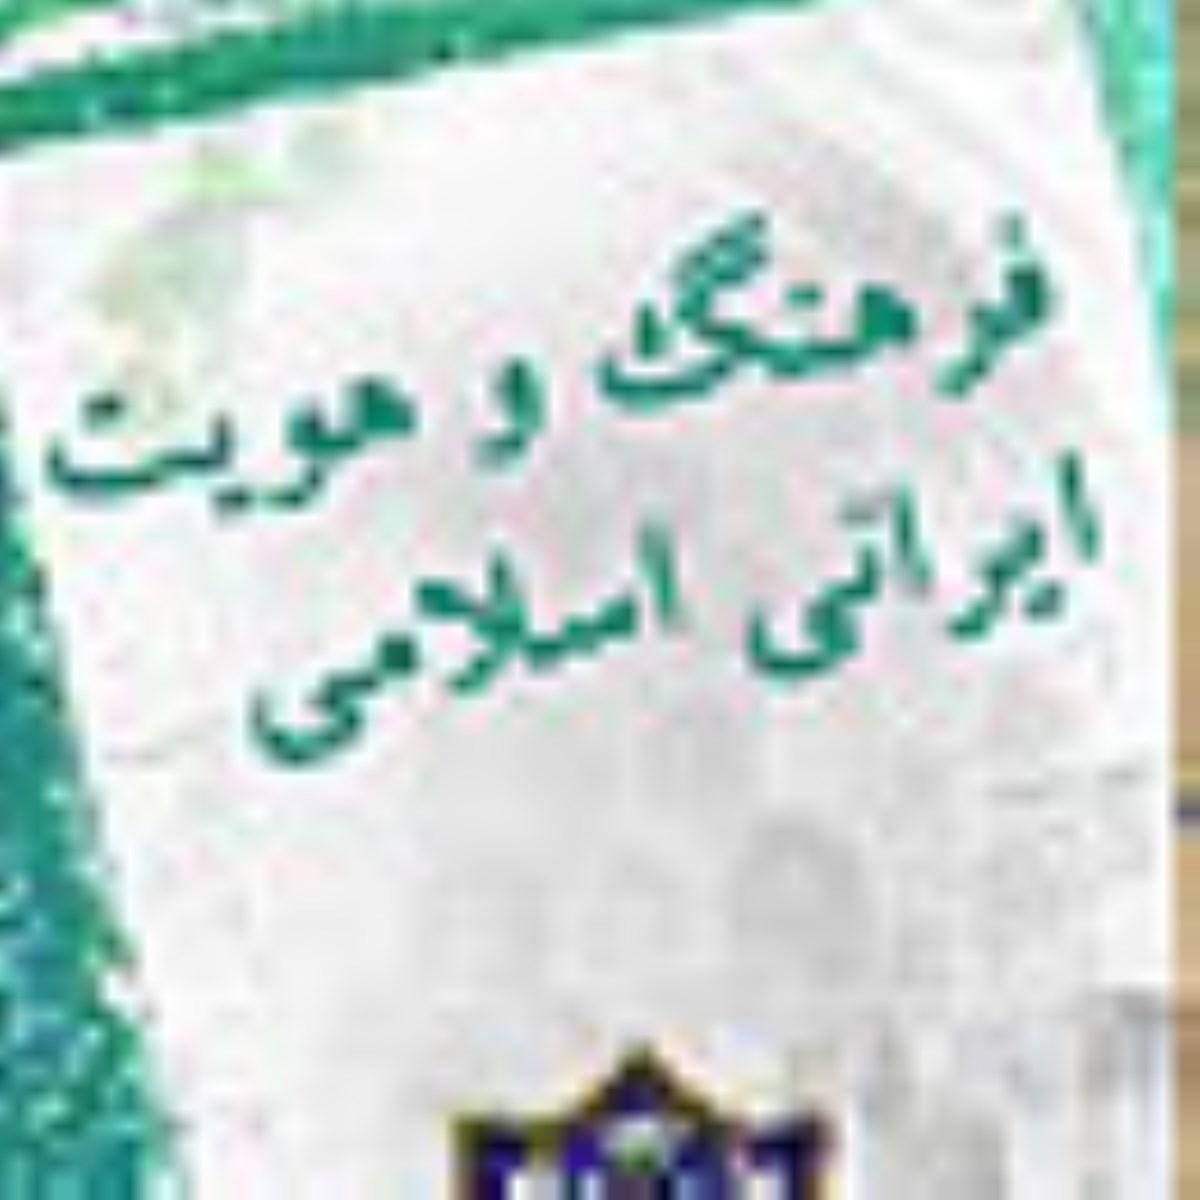 بنيان هاي فرهنگ و هويت ايراني اسلامي